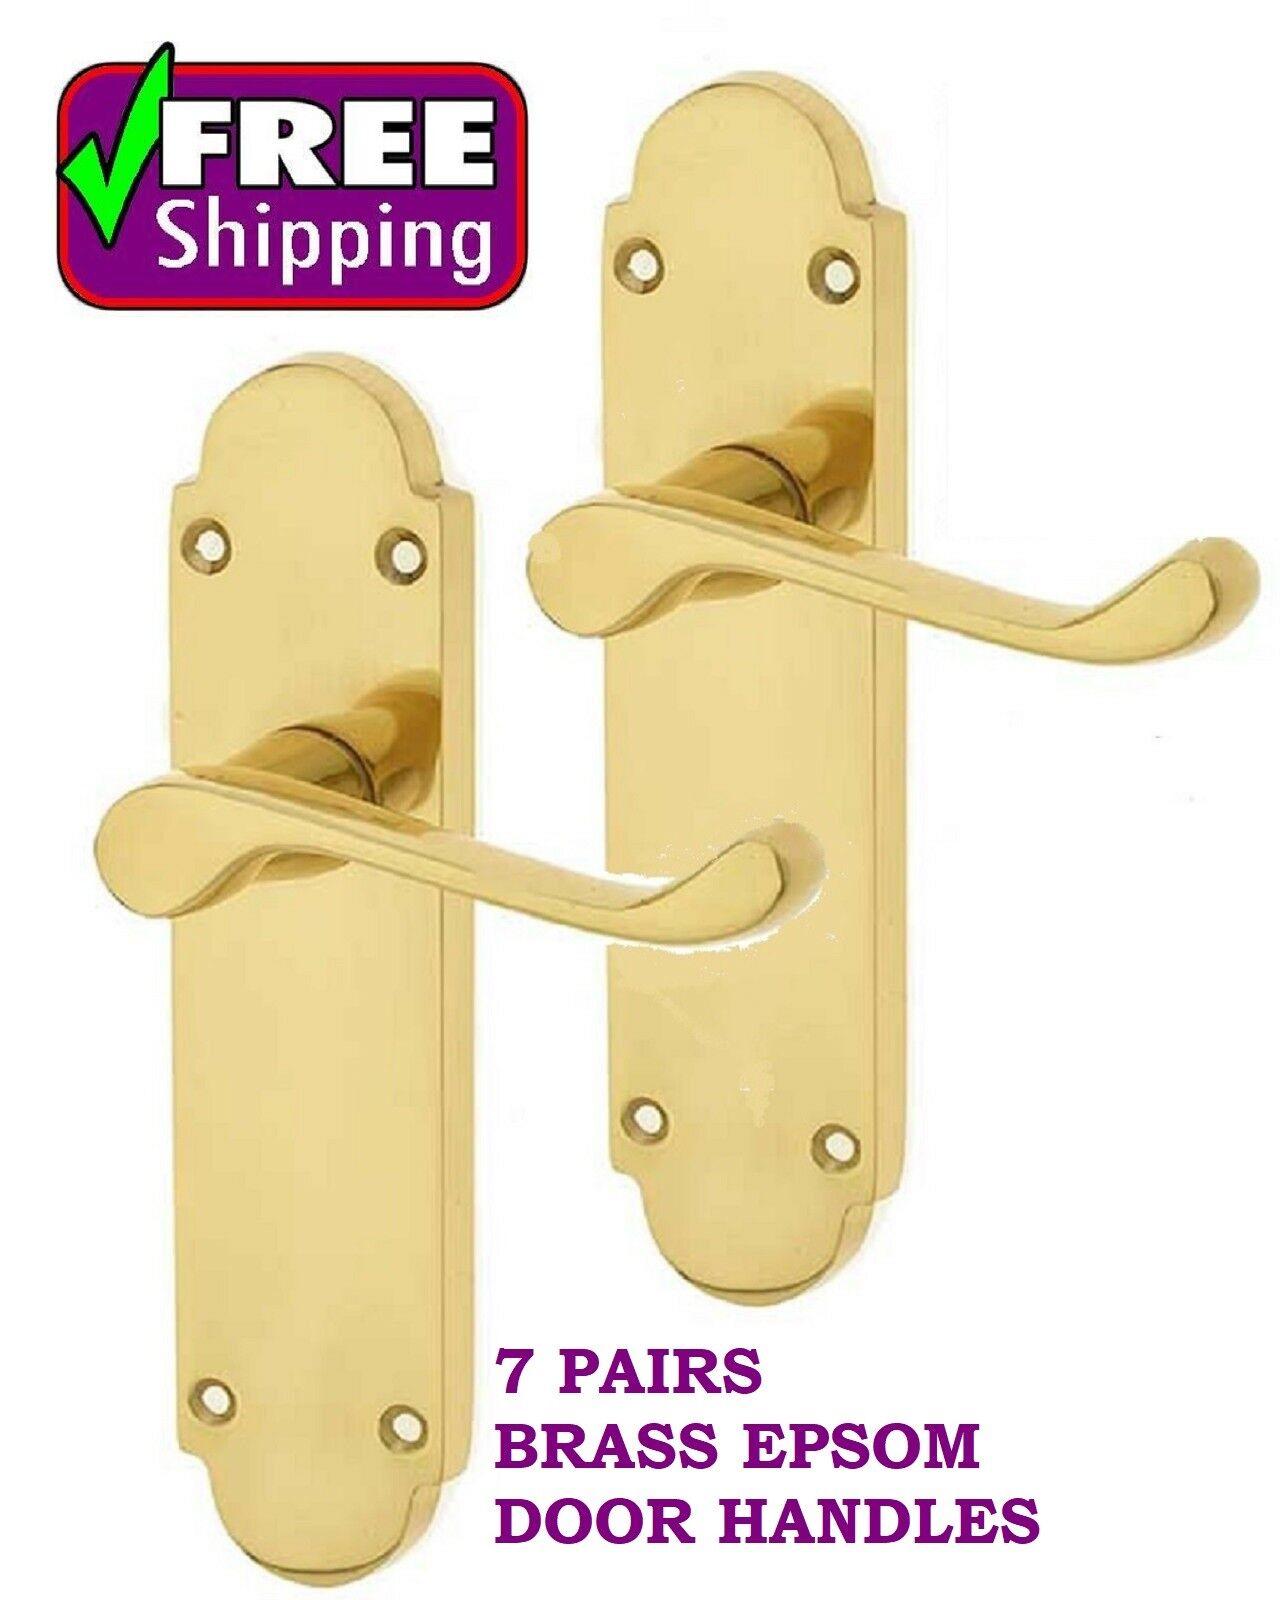 7 Pairs BRASS EPSOM Interior Latch Door Handles 168 x 42mm FREE DELIVERY D1